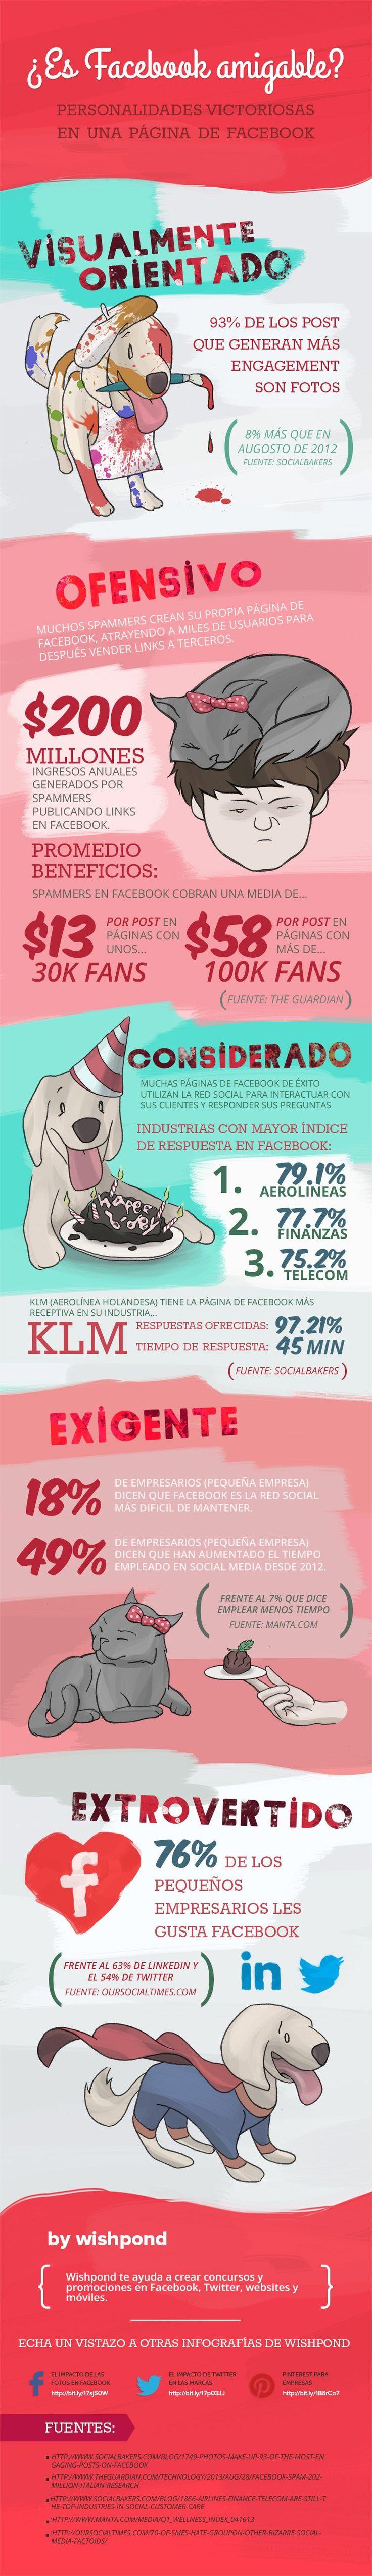 Curiosidades de Facebook #infografia